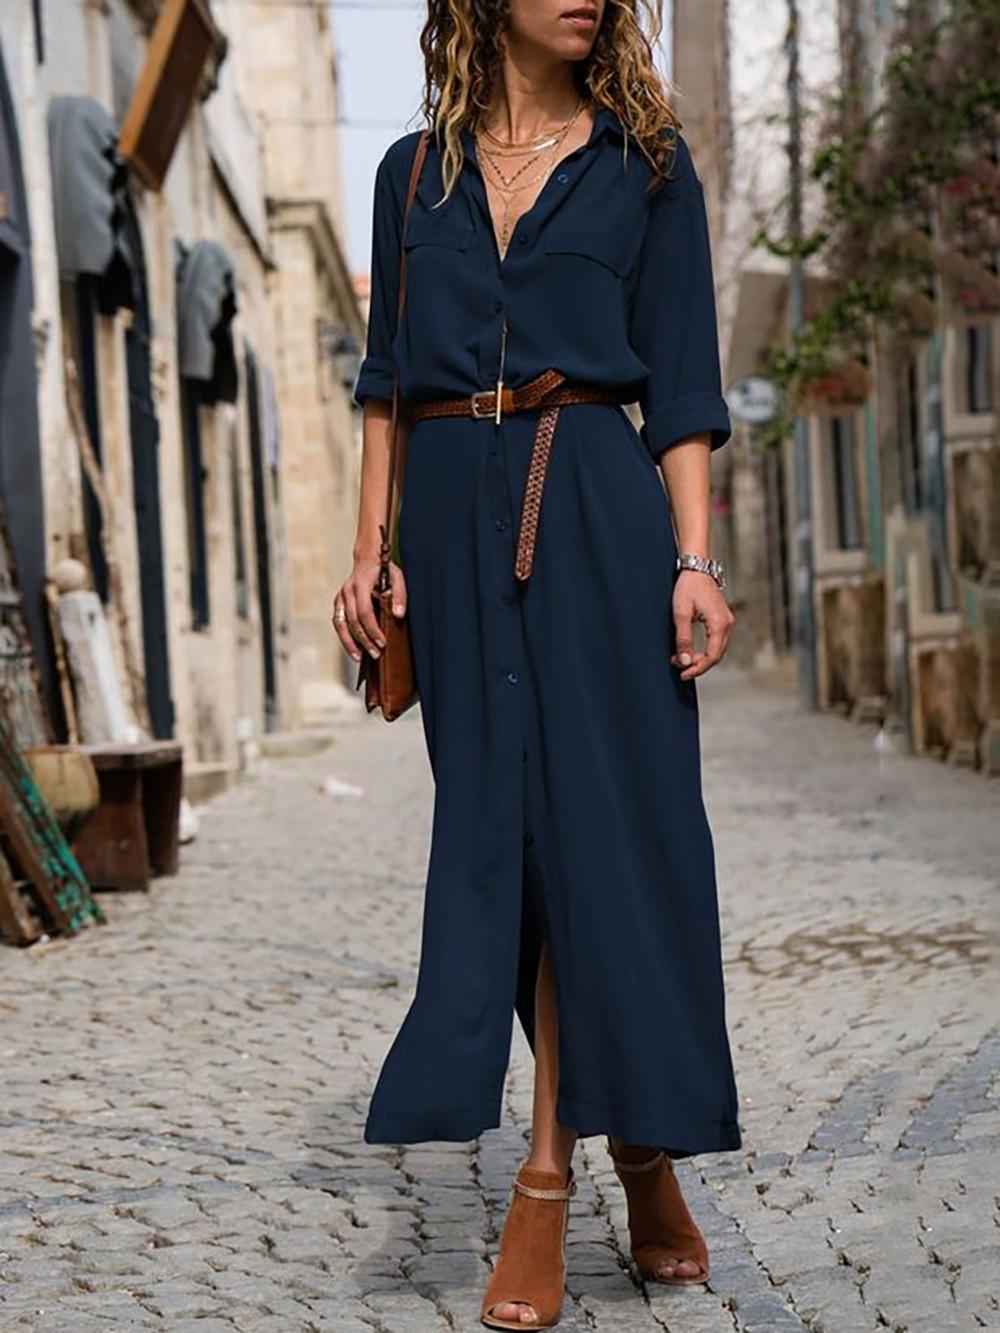 Droit Decontracte Unicolore Robes Mokolly Long Dress Casual Elegant Dresses Long Summer Dresses For Women [ 1333 x 1000 Pixel ]